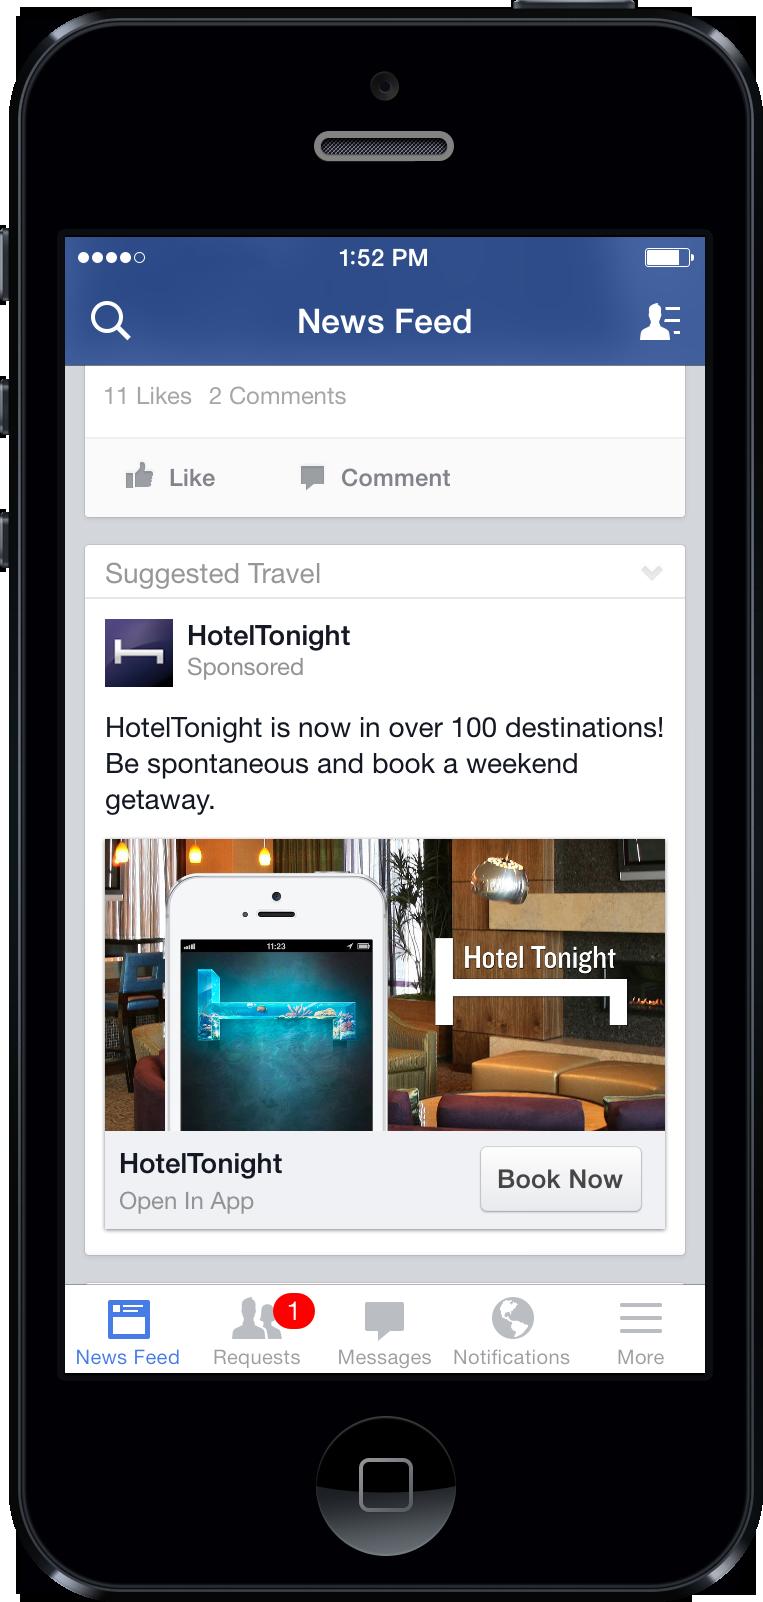 Facebook Mobile App Install Ads Capture Revenue, Drive ... |Facebook Mobile App